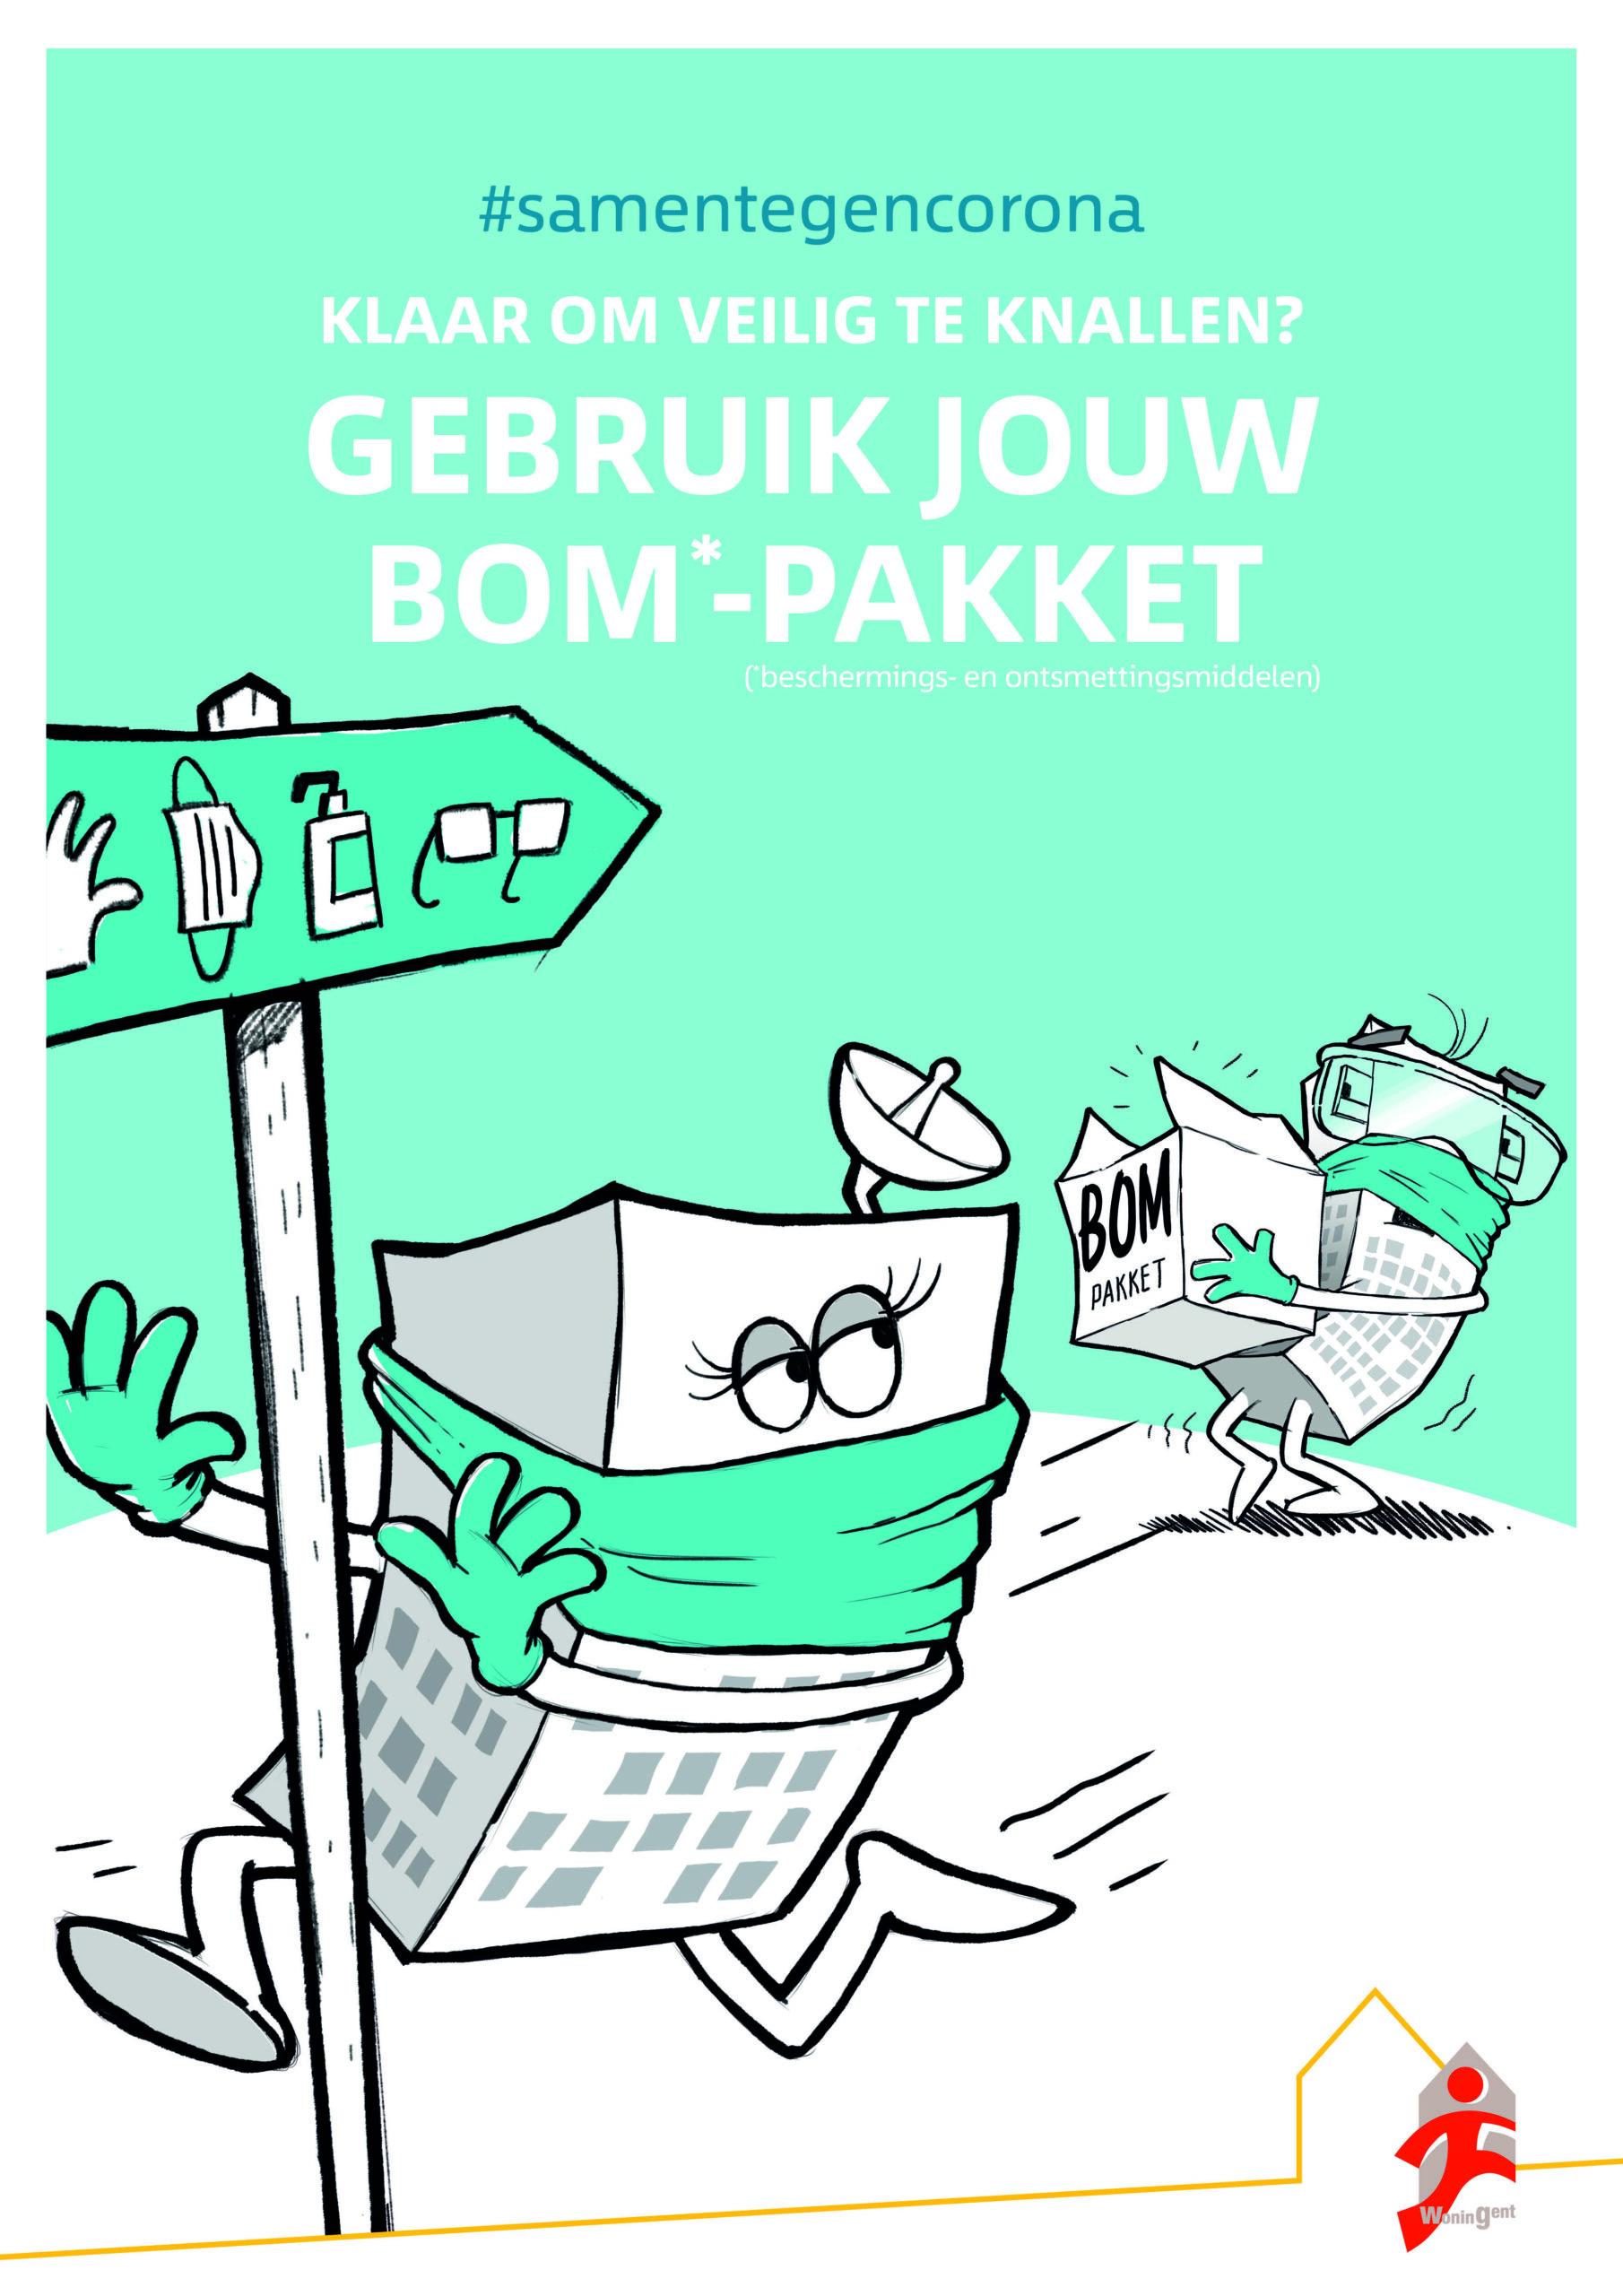 WoninGent_BOMpakket_interne communicatie versterken